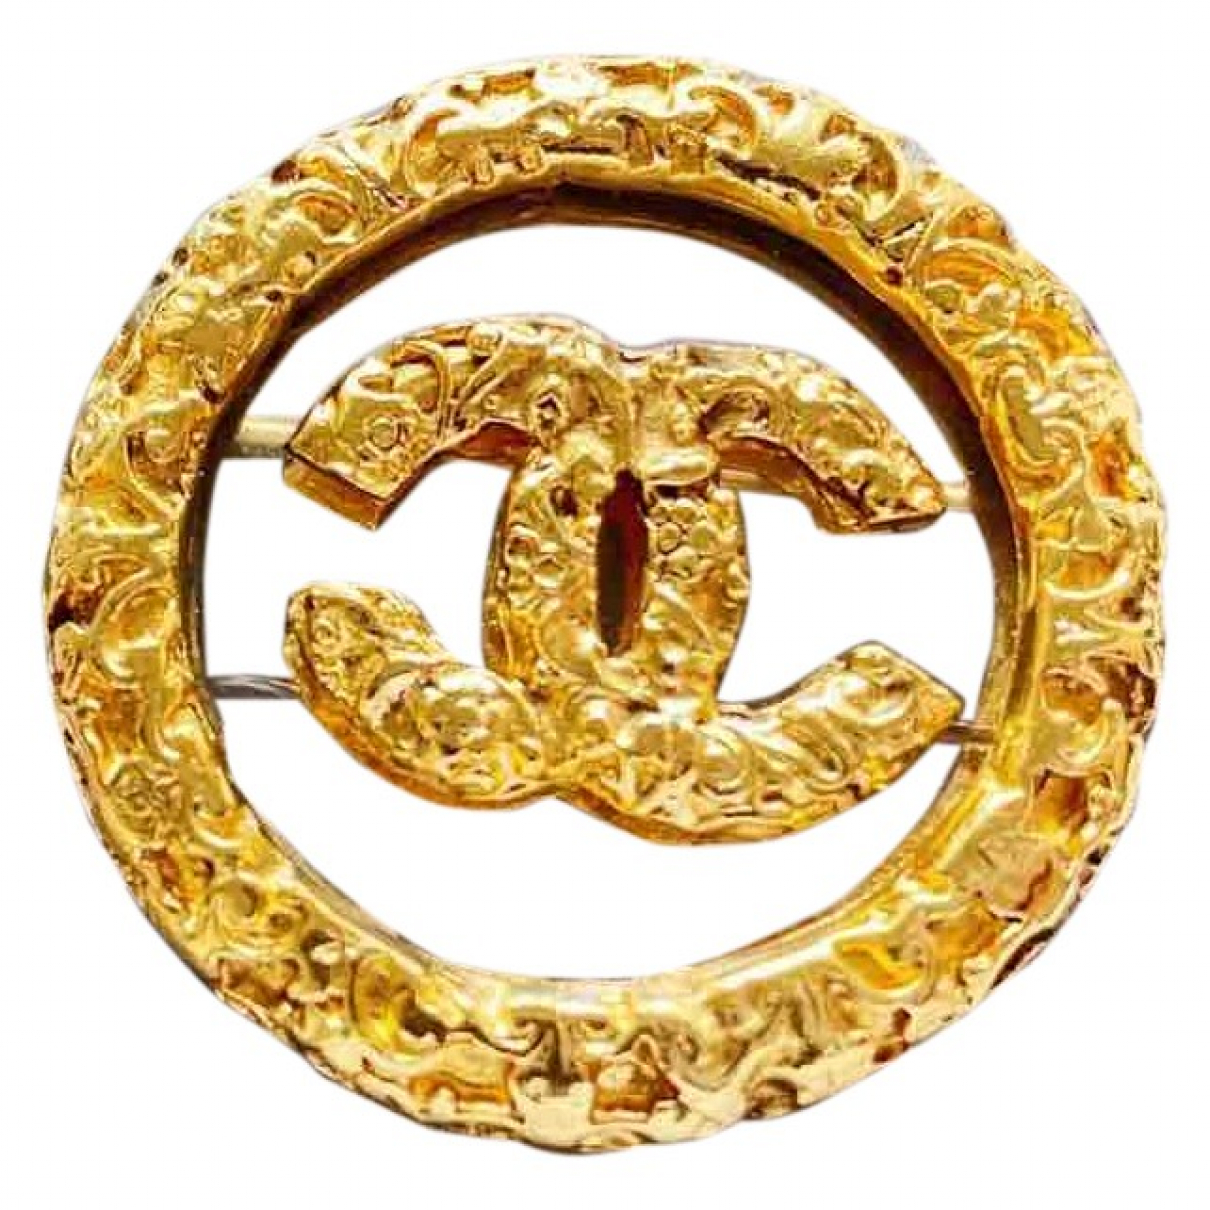 Broche CC en Metal Chanel